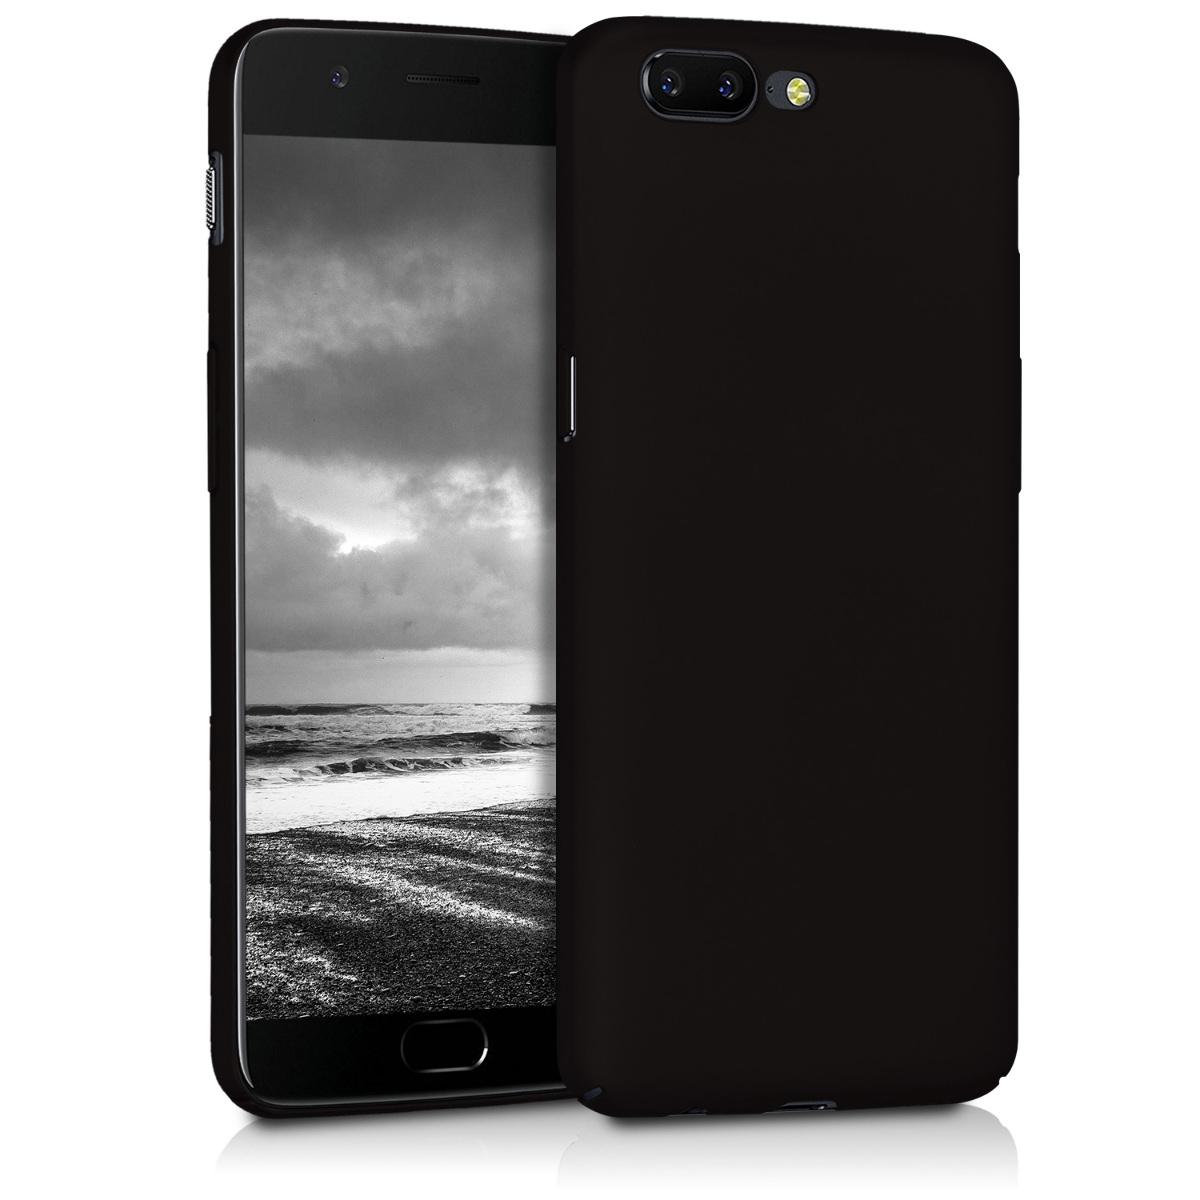 KW Slim Anti-Slip Cover - Σκληρή Θήκη Καουτσούκ OnePlus 5 - Μαύρο  (43259.47)